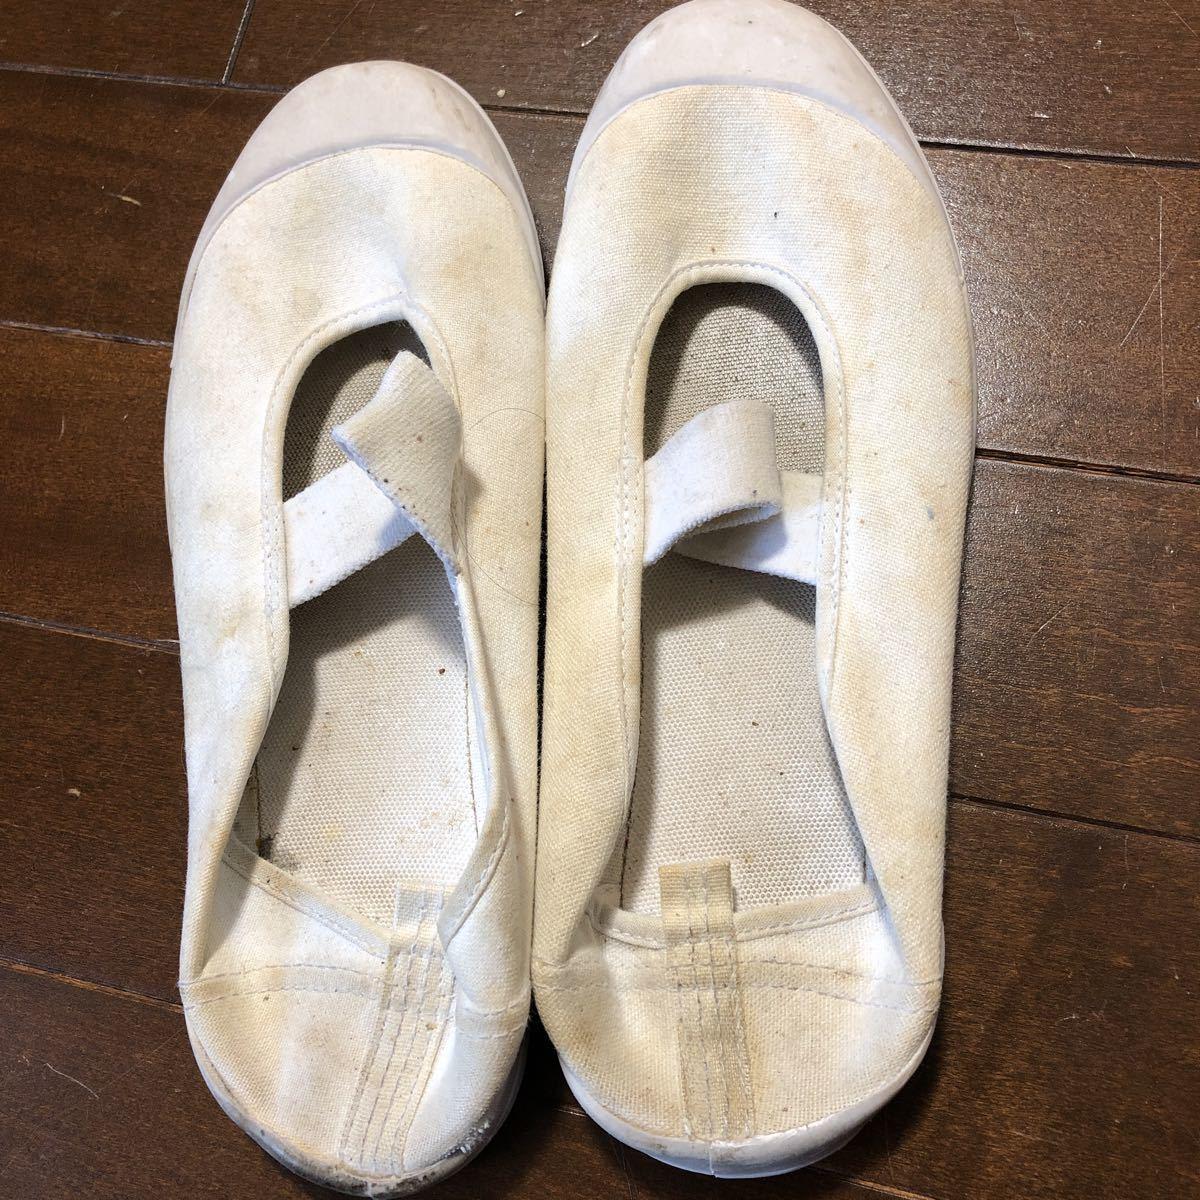 used 上履き スクールシューズ 23.5センチ